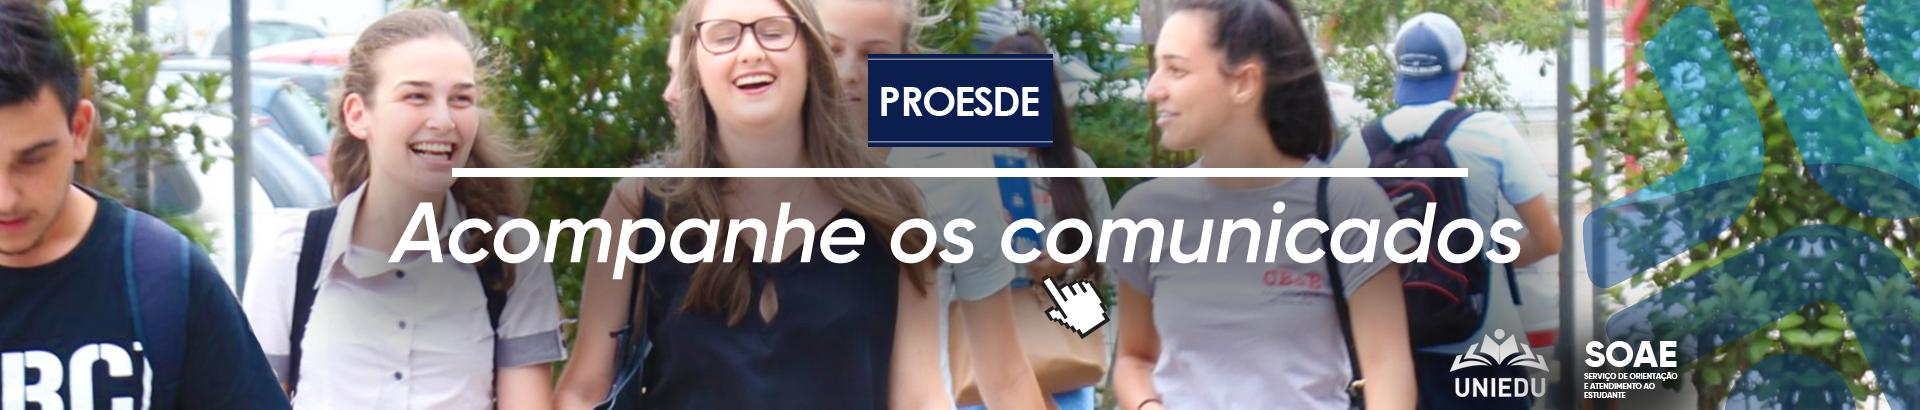 bOLSA-proesdE-(banner-site)-29-03